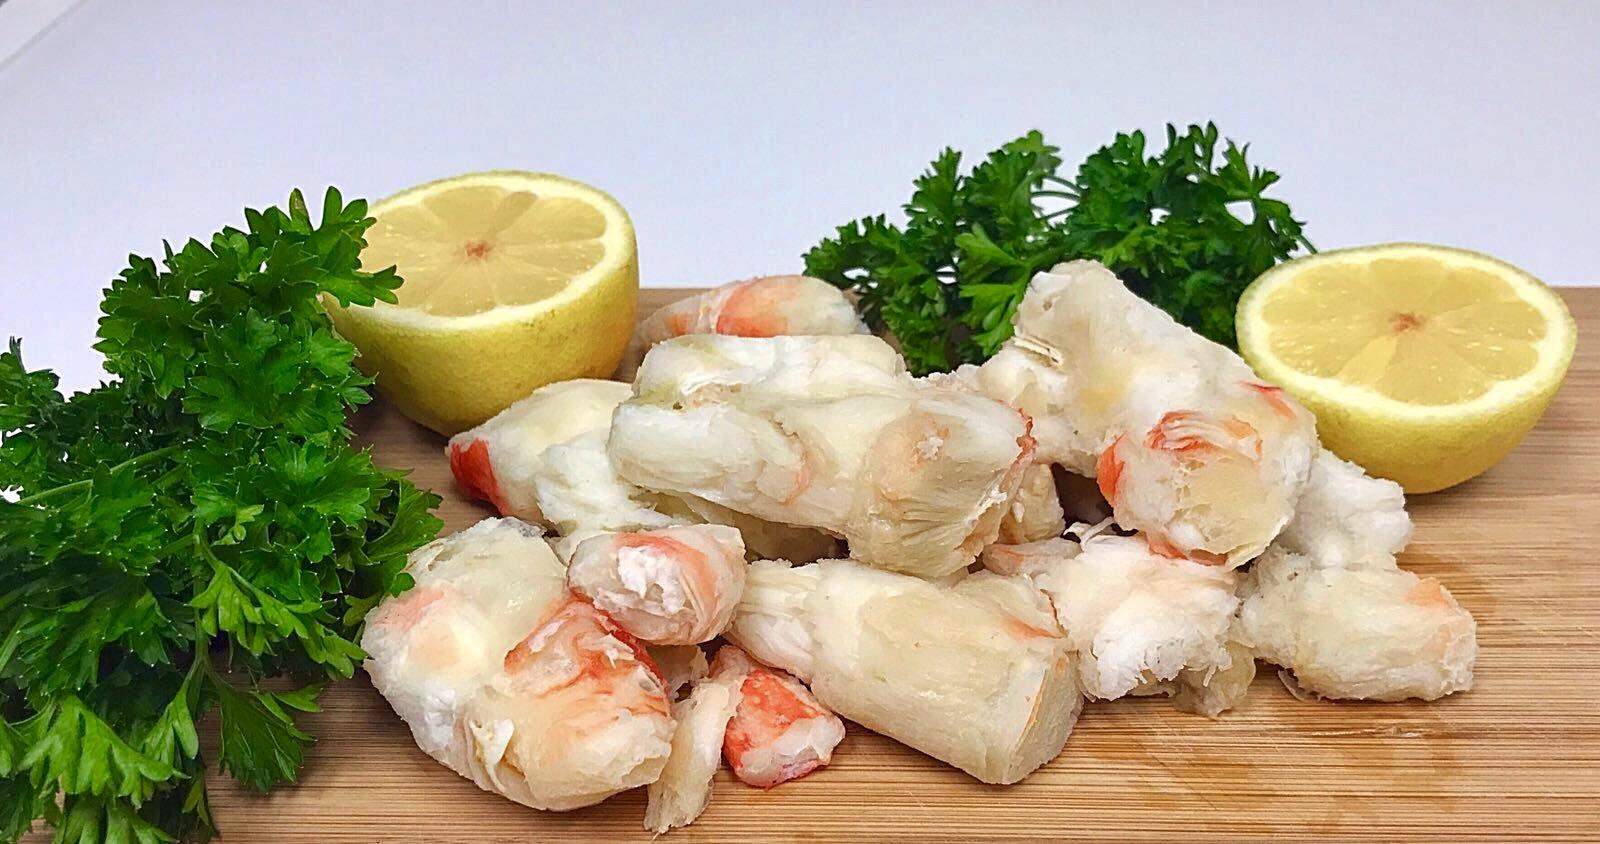 Soft Shell Crab Supplier, Soft Shell Crab Distributor, Crab